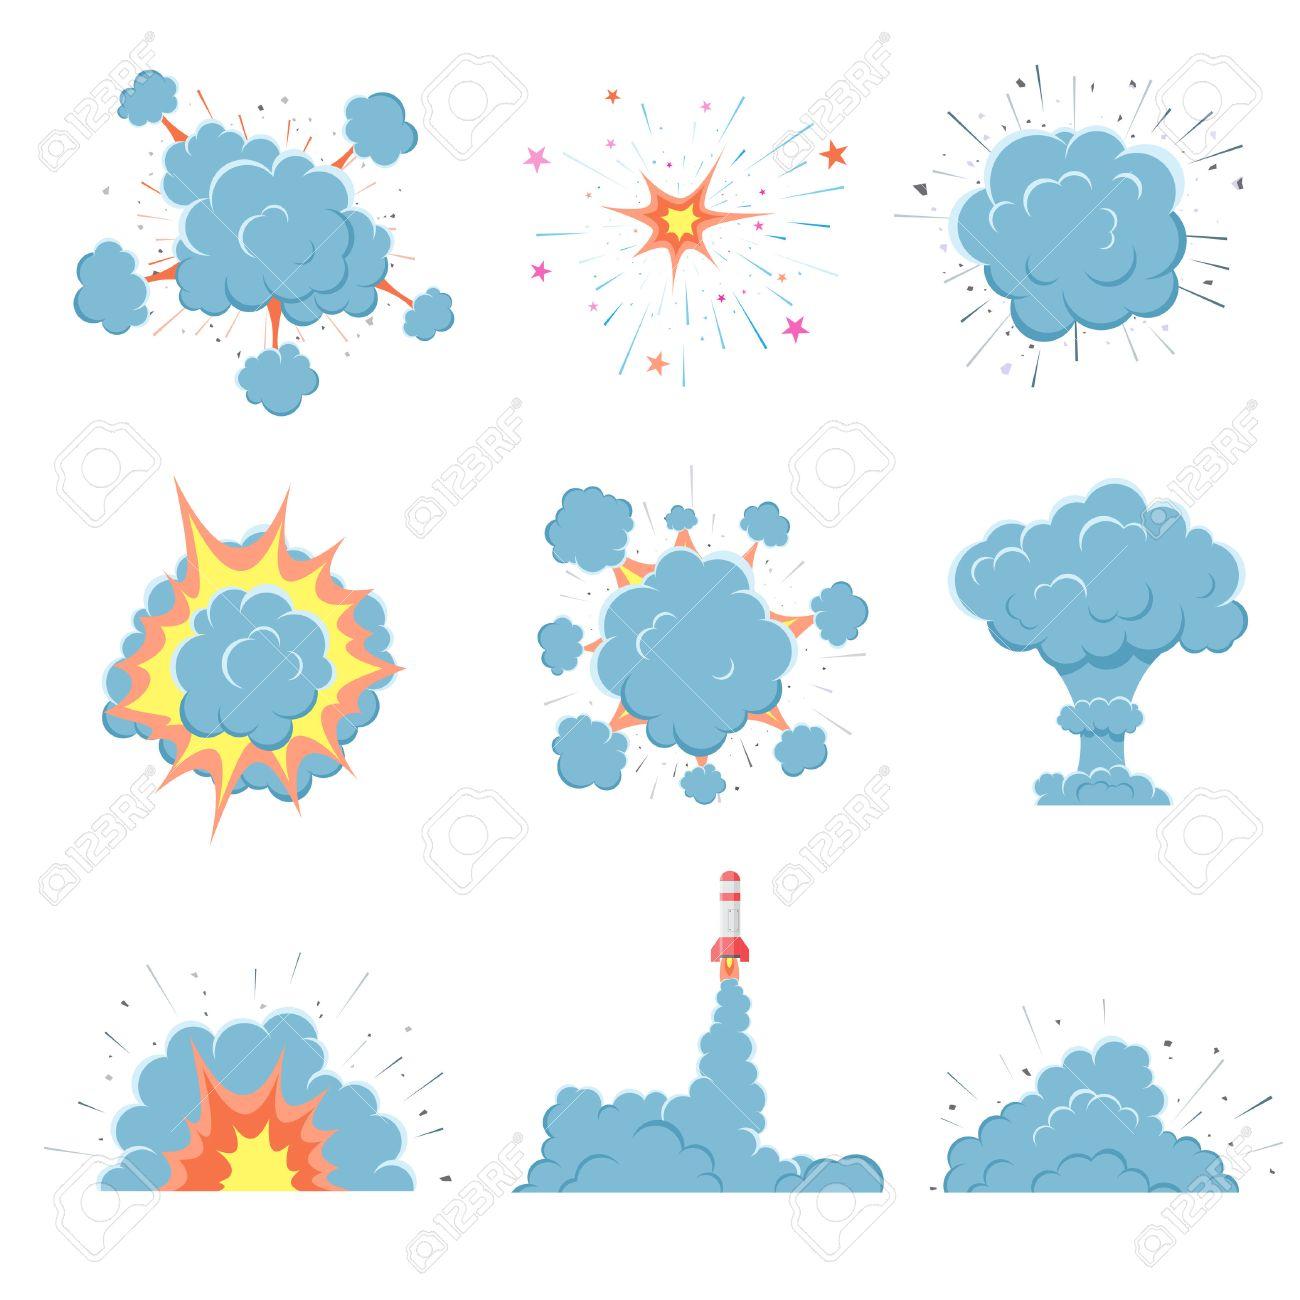 Cartoon vector bomb explosion with smoke  Cartoon style  Effect